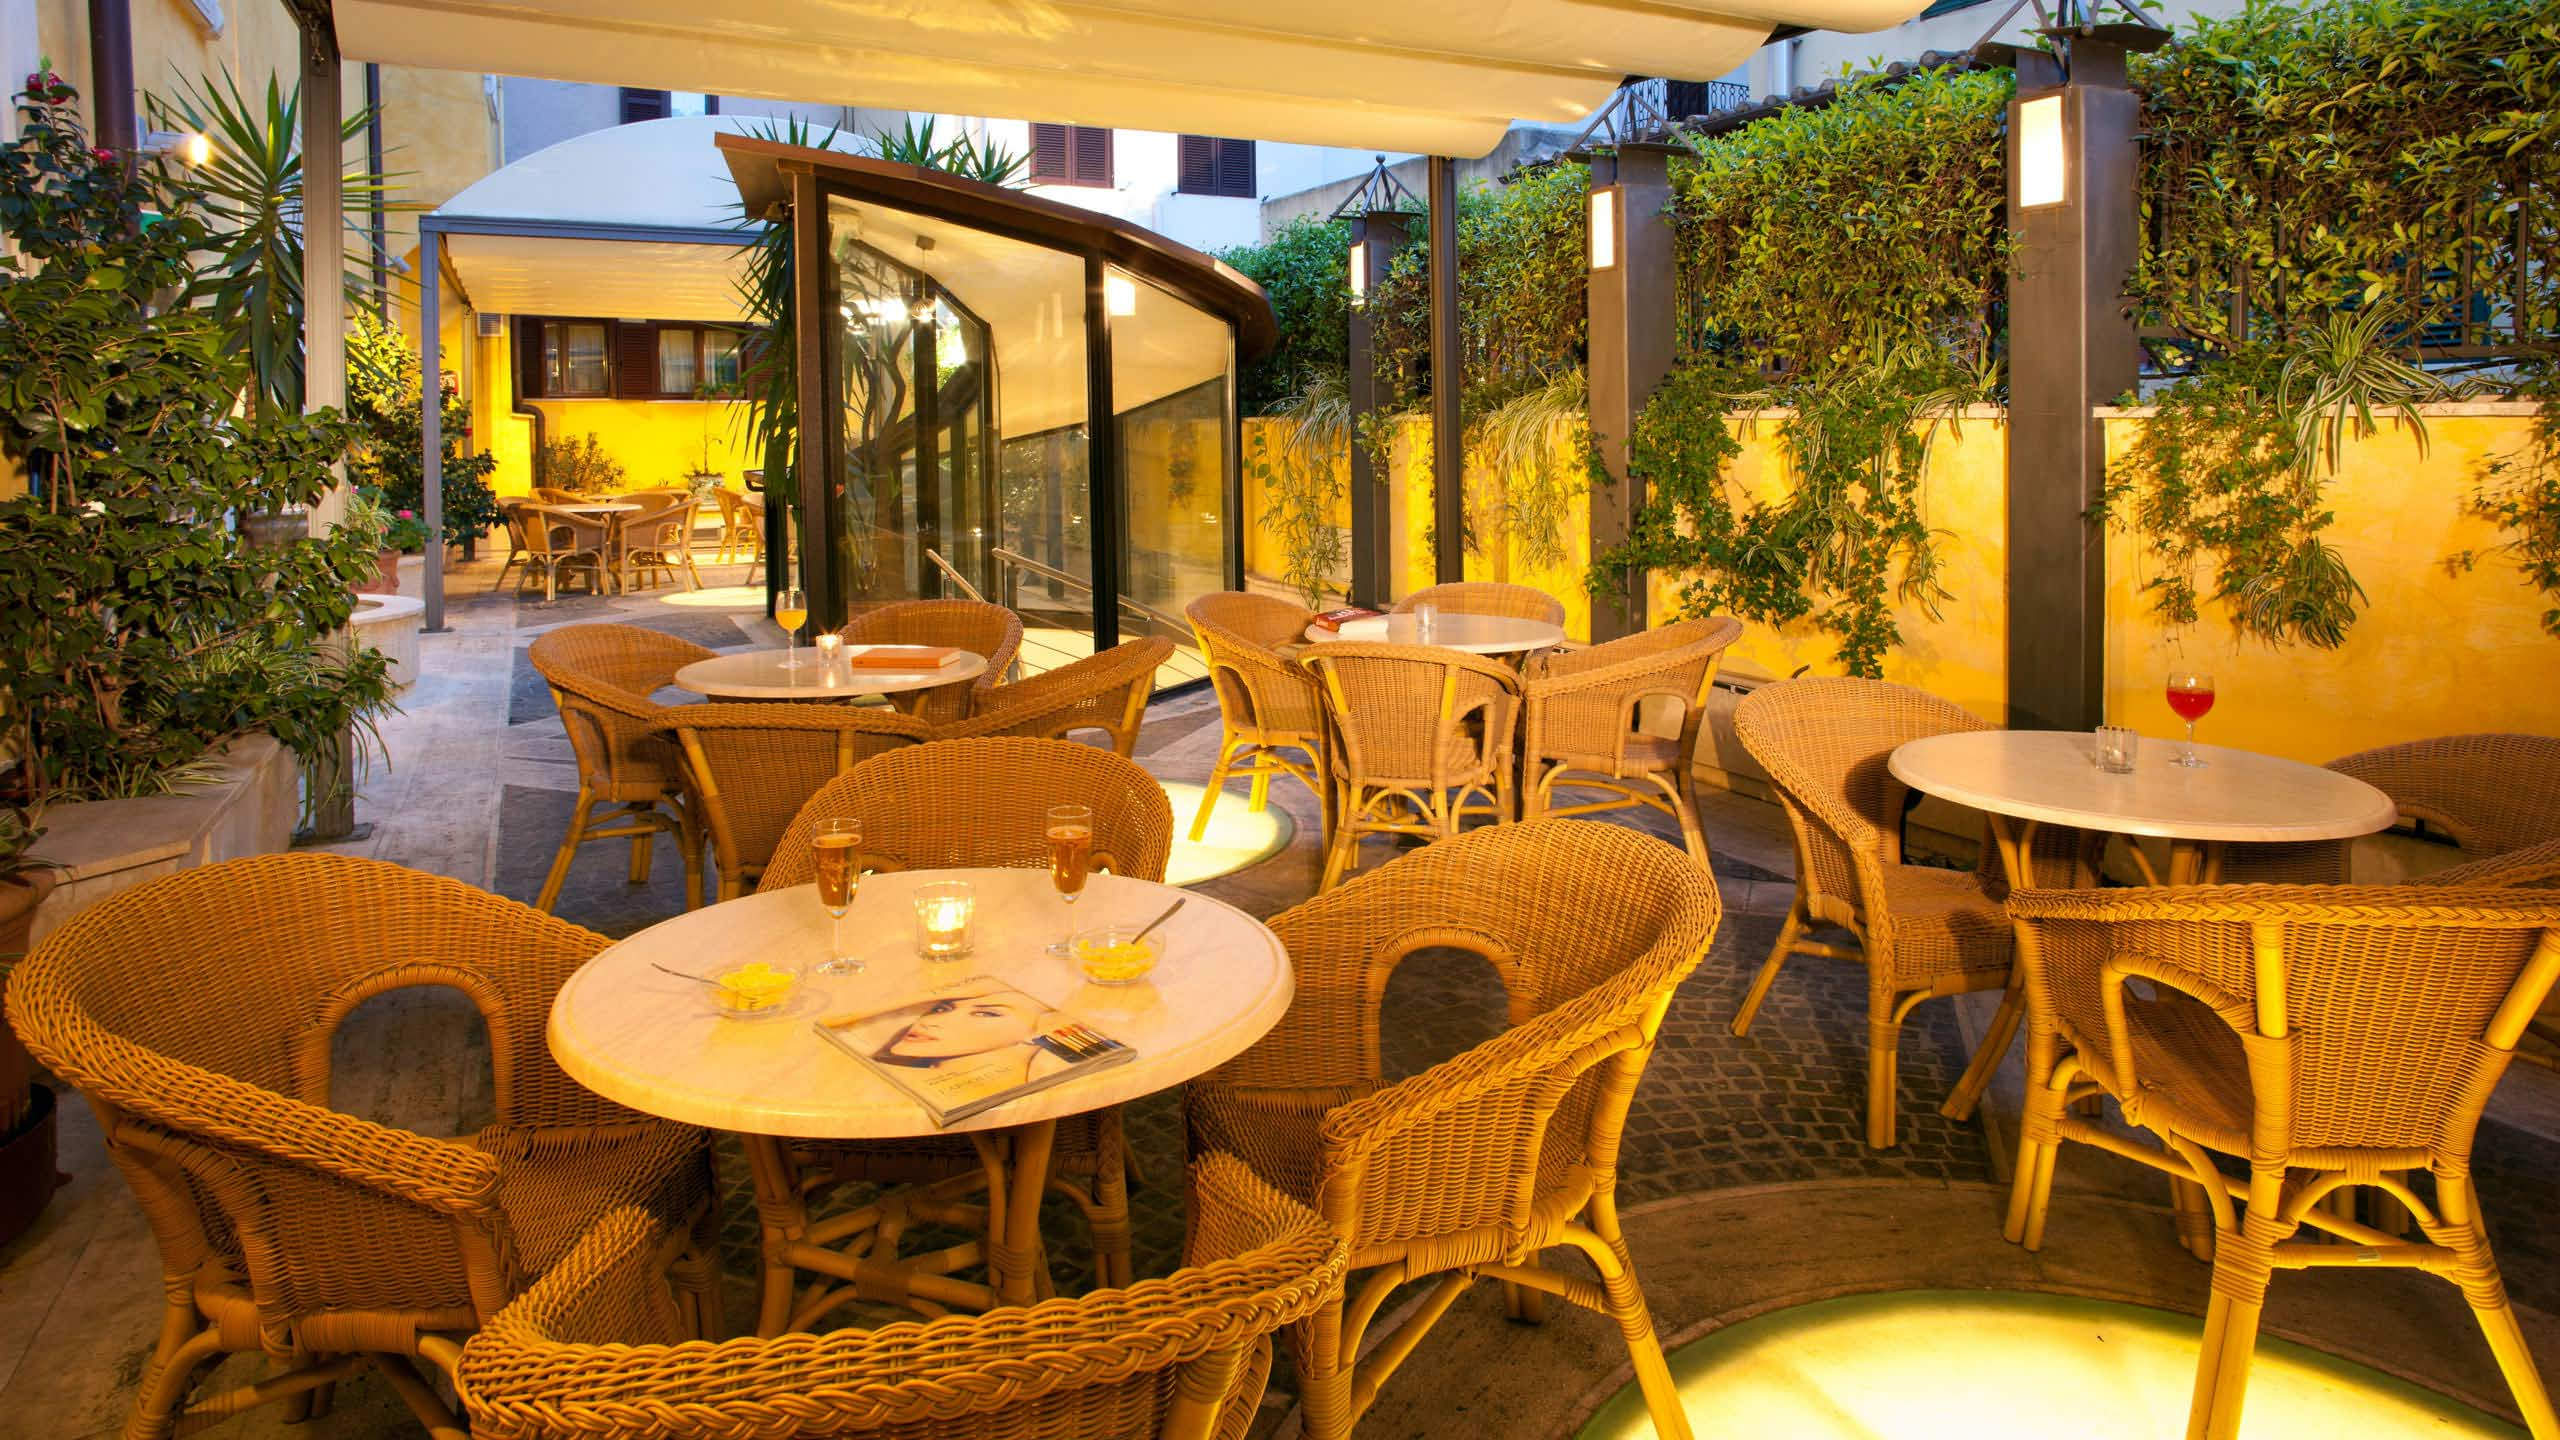 Windrose Hotel Roma